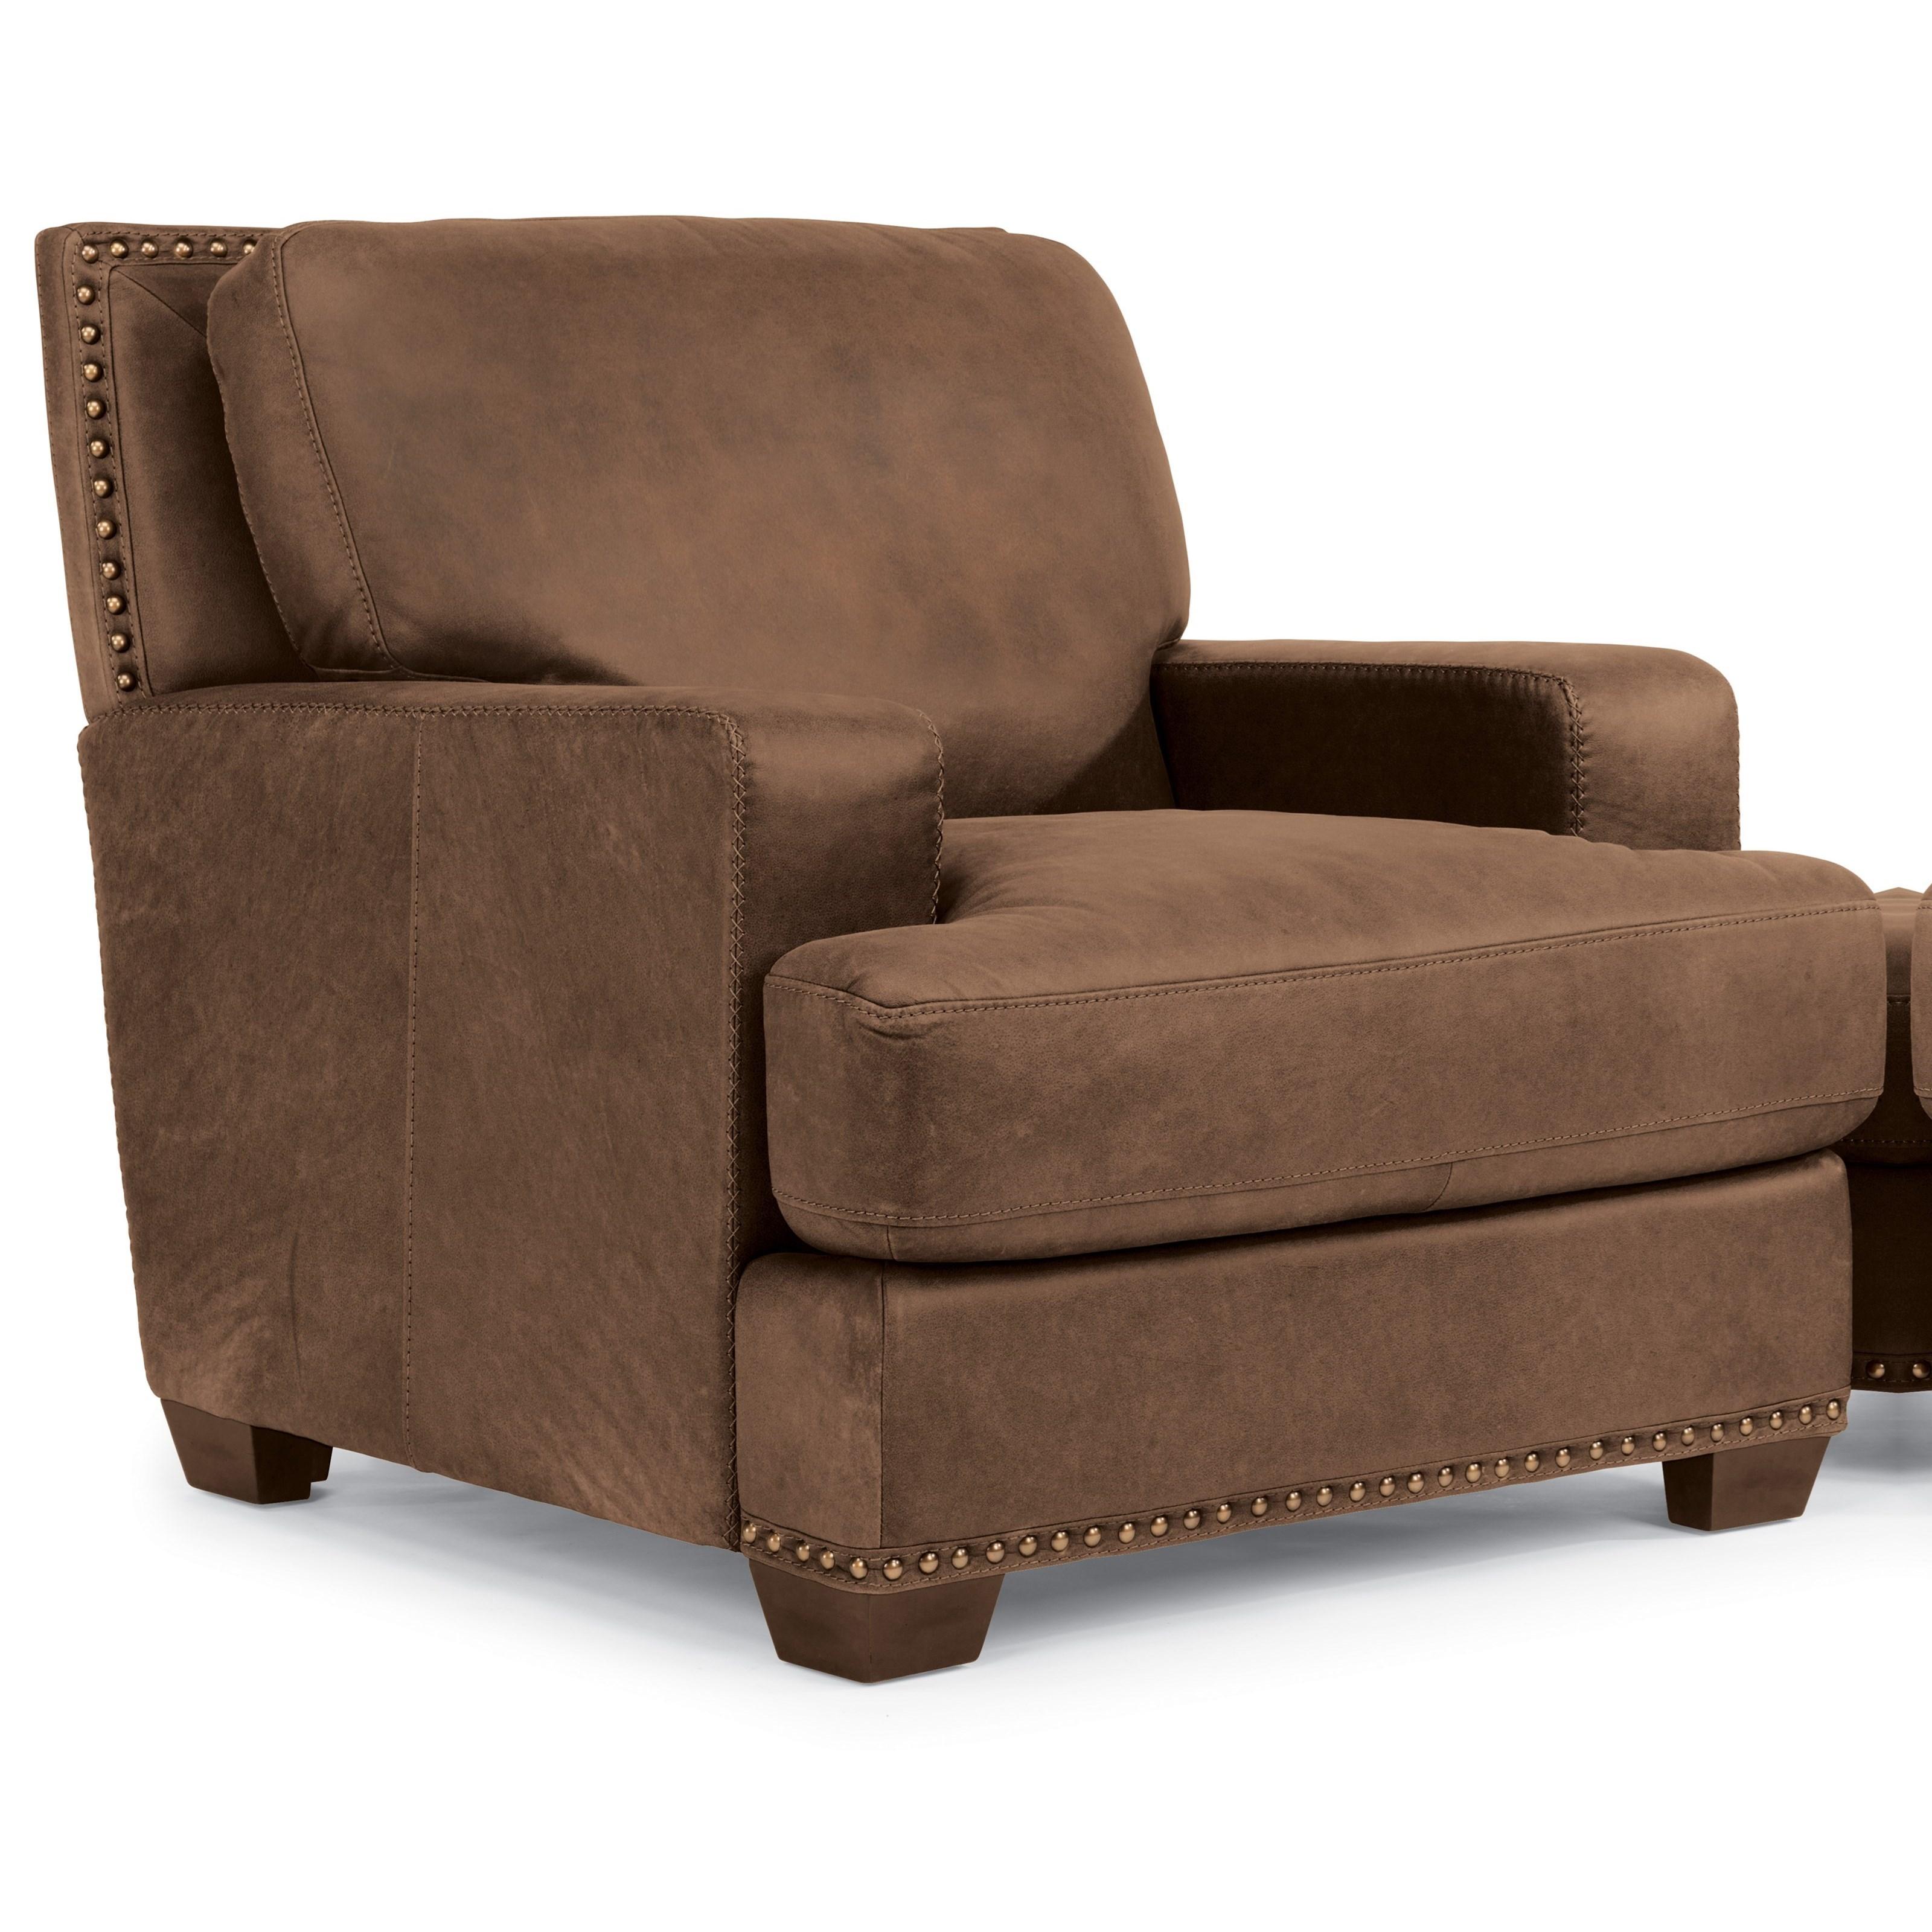 Flexsteel Latitudes-Fremont Leather Chair  - Item Number: 1324-10